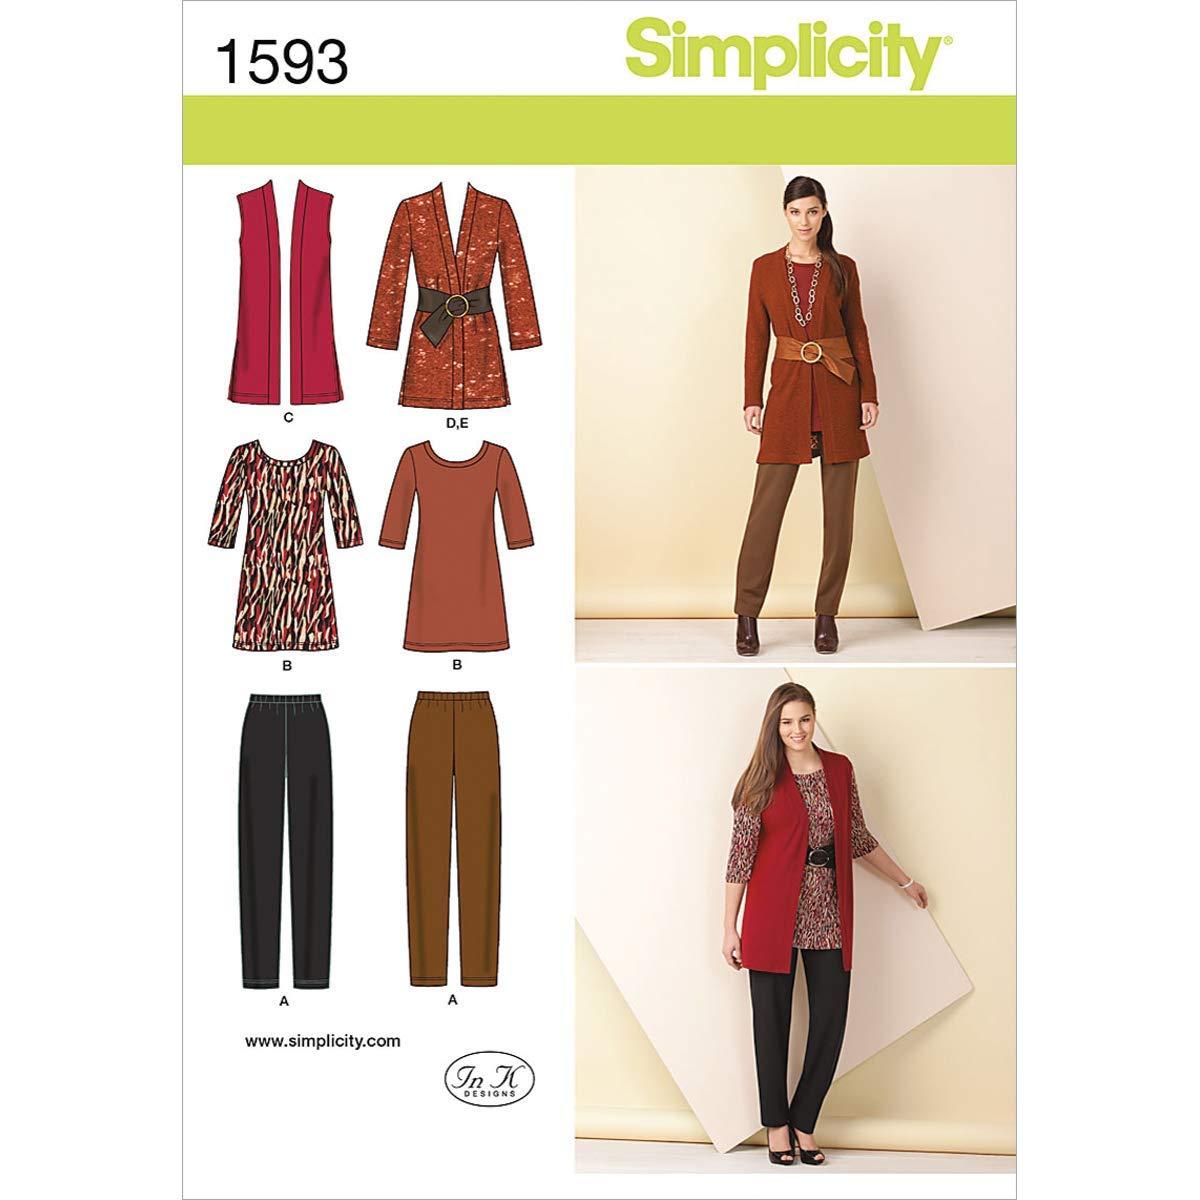 Simplicity Pattern 1593 Misses Knit Slim Pants, Tunic, Jacket, Vest, Belt Size 10-12-14-16-18